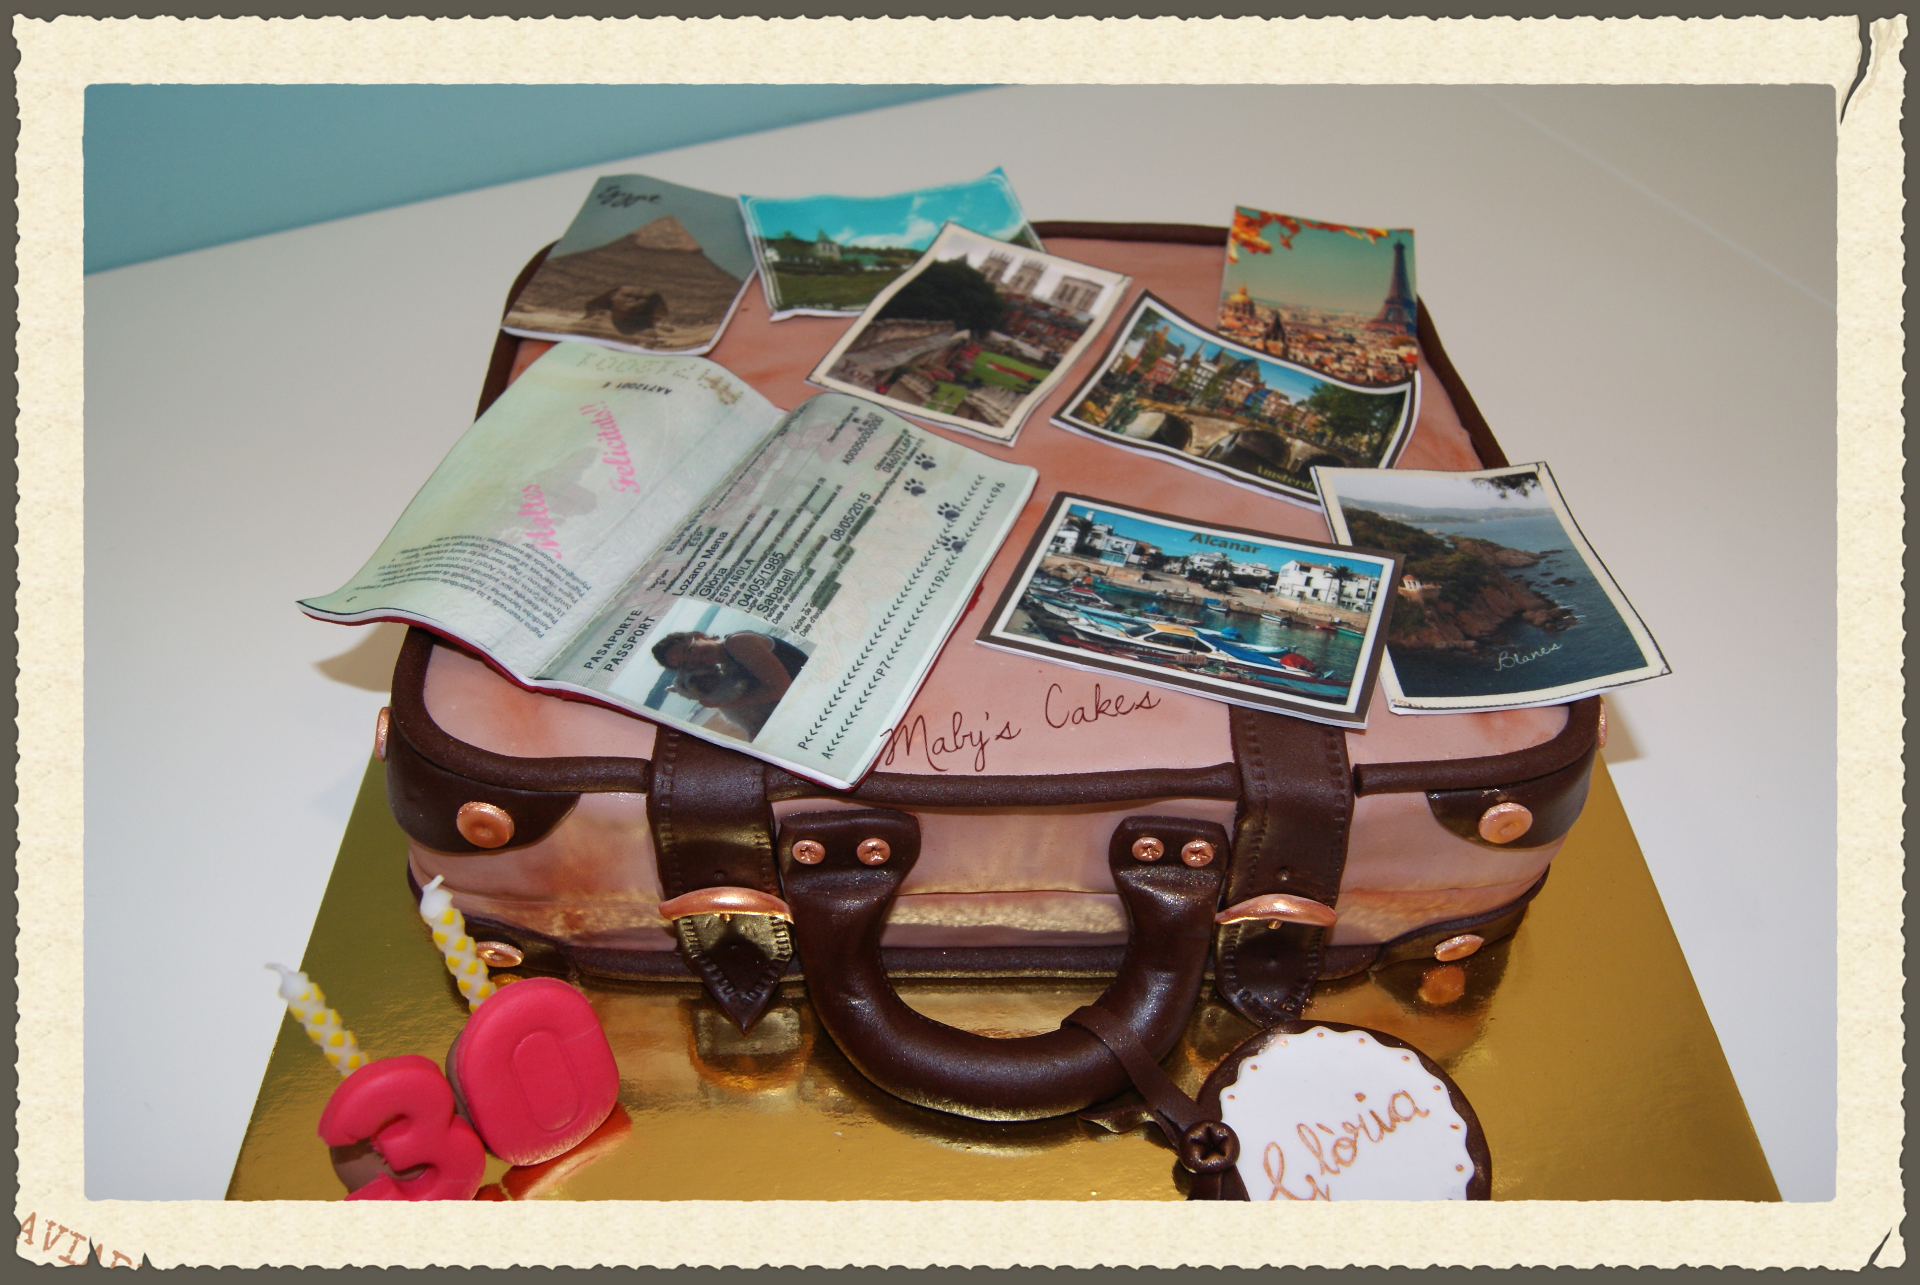 Tarta_Maleta_Pastel_fondant_personalizado_Mabys_Cakes_www.mabyscakes.com_Sabadell_Terrassa_Cumpleaño